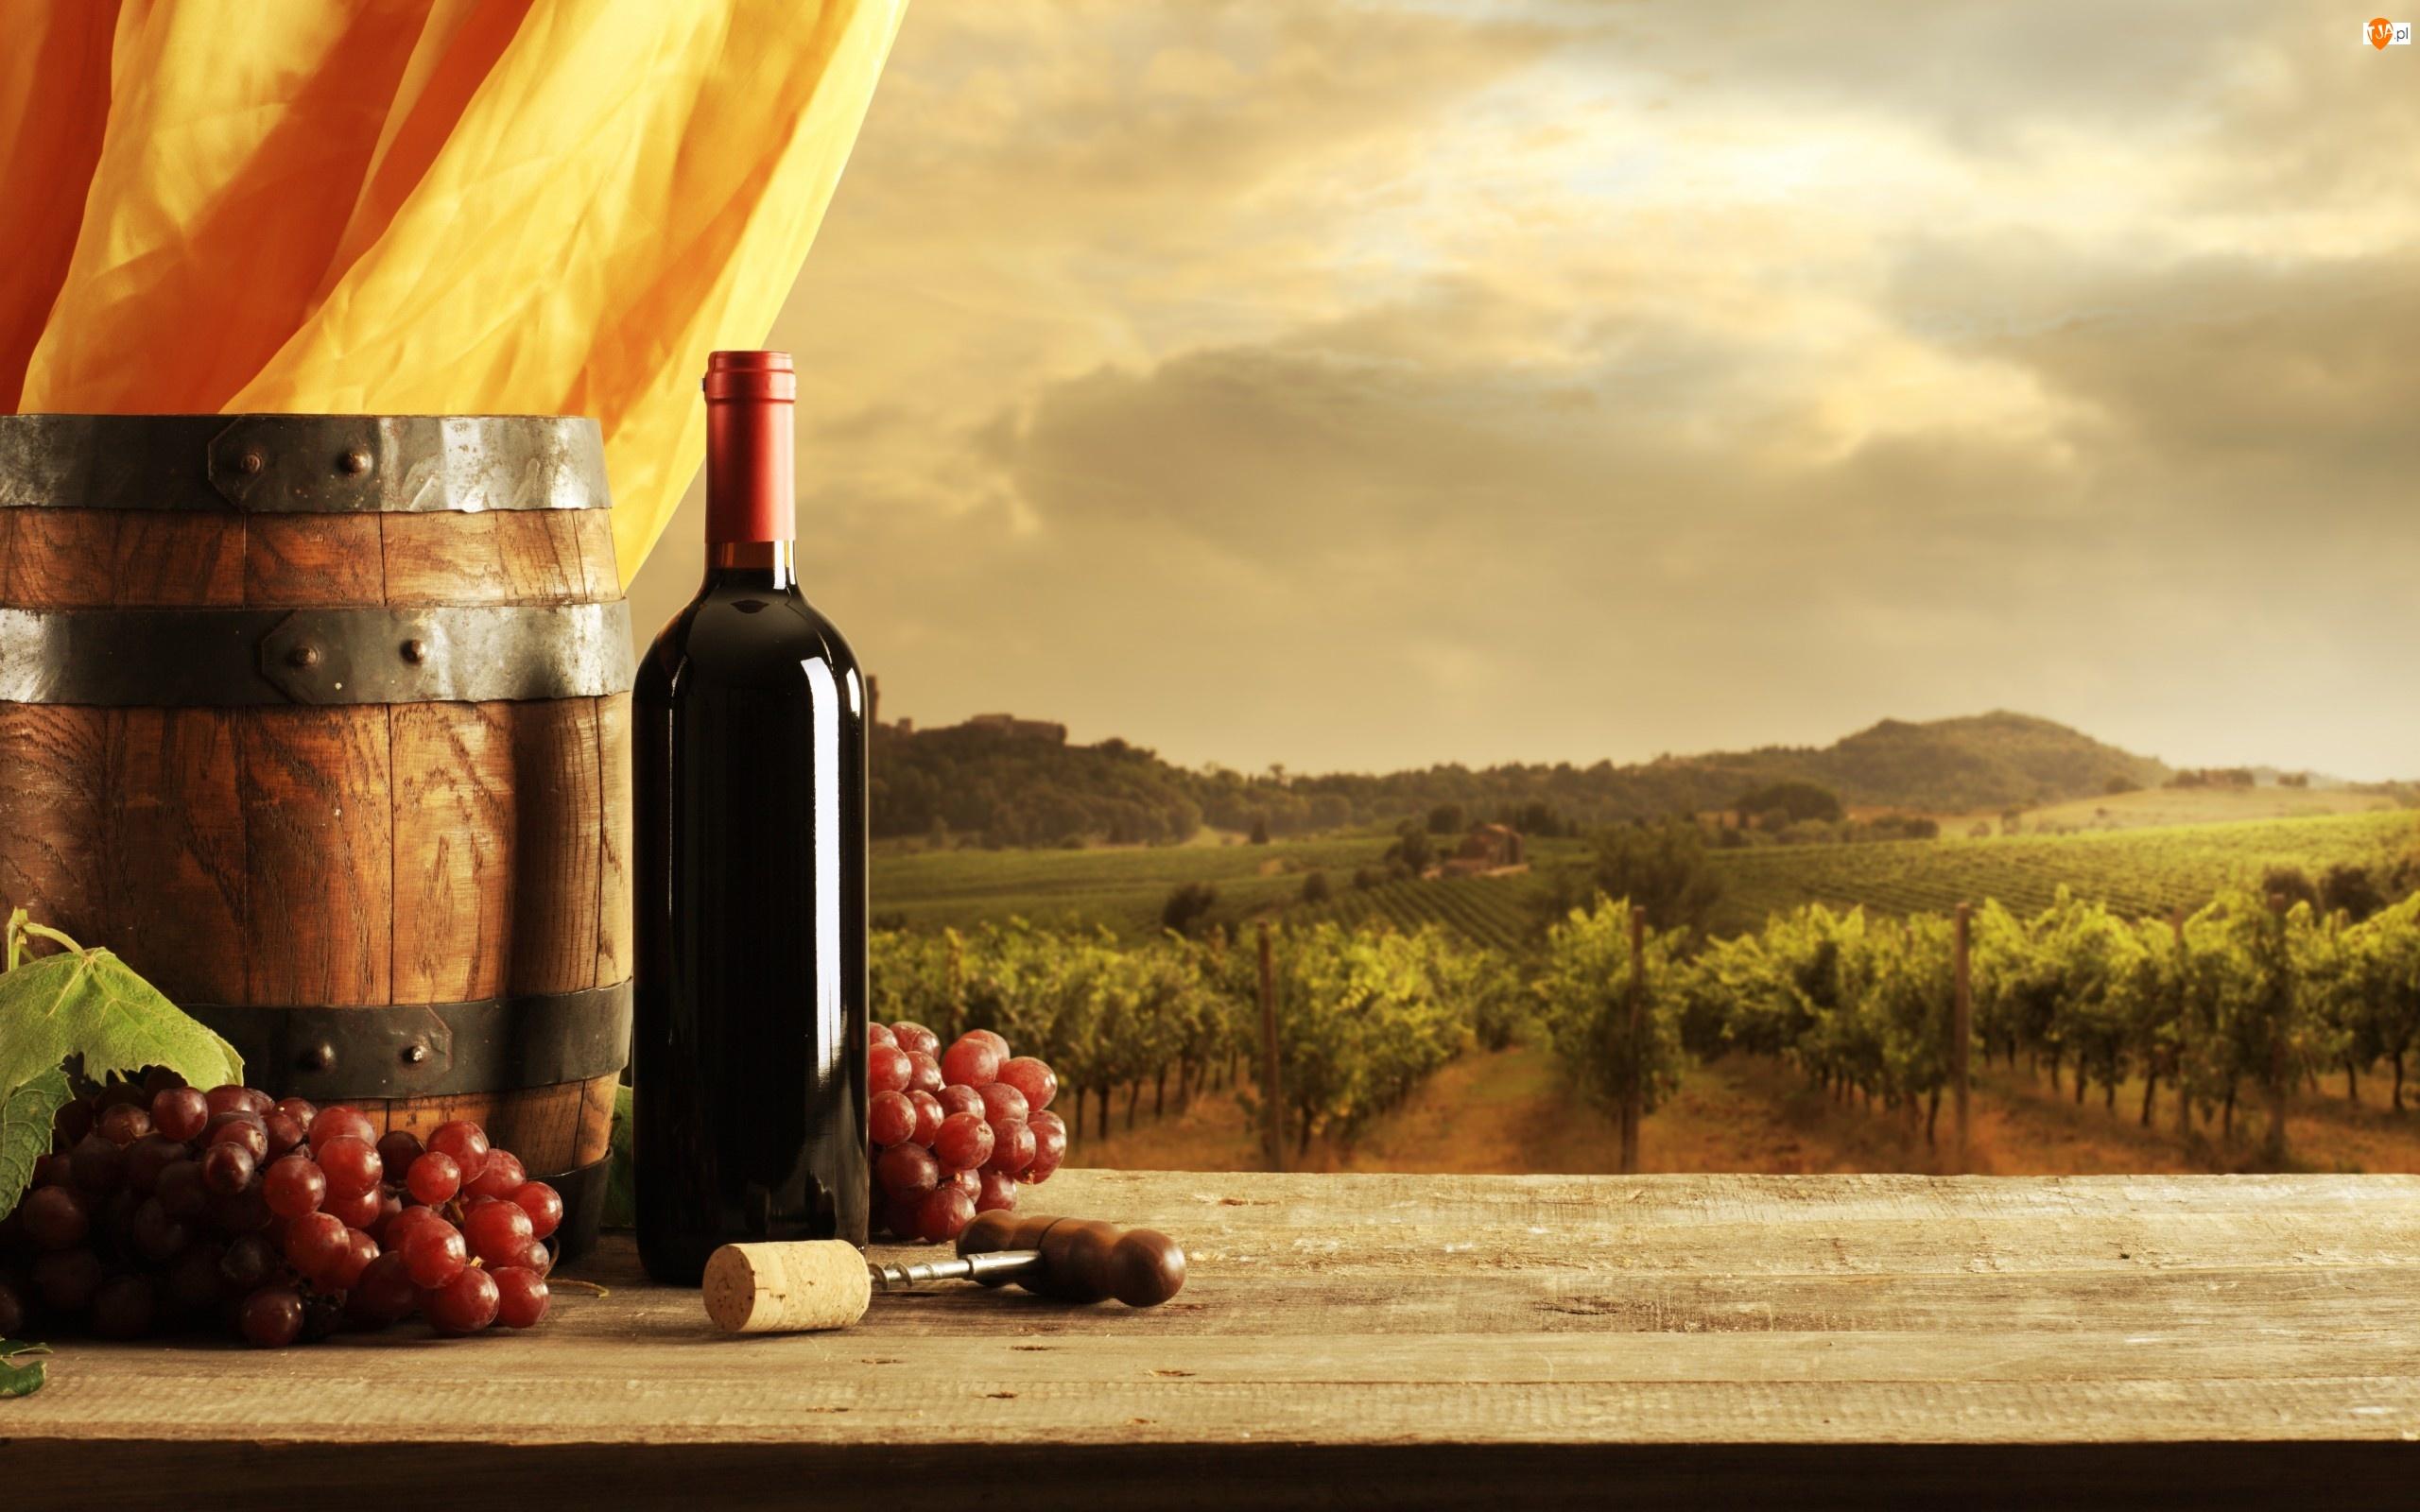 Korkociąg, Winogrona, Beczka, Owoce, Butelka, Wino